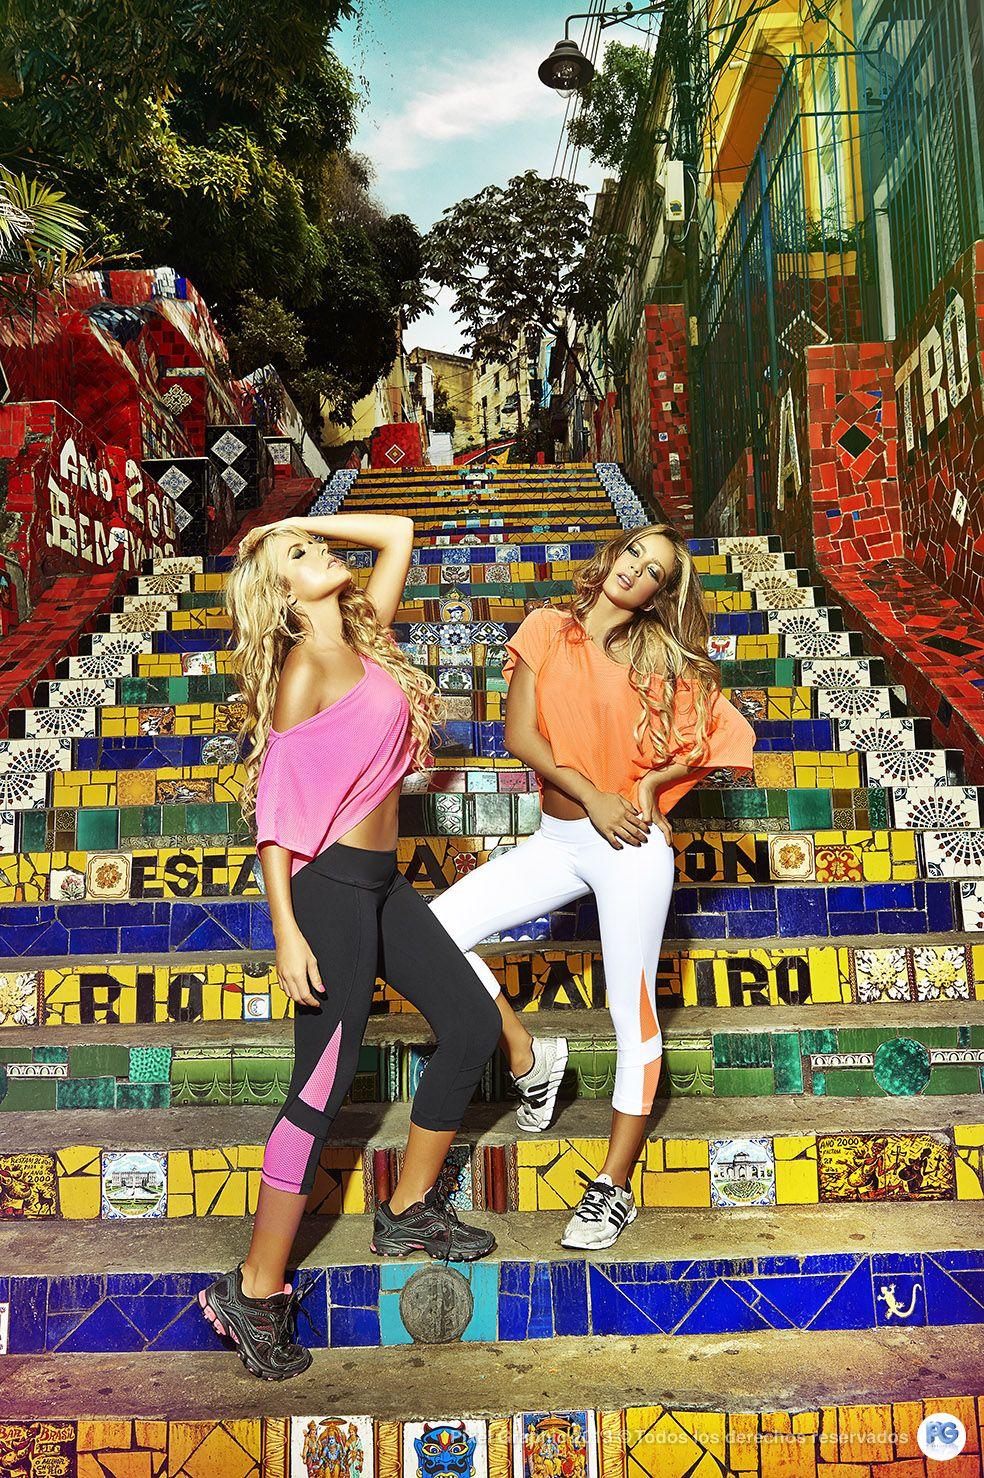 #Post-Producción #RetoqueDigital #DigitalRetouch #Photoshop #Fashion #Moda